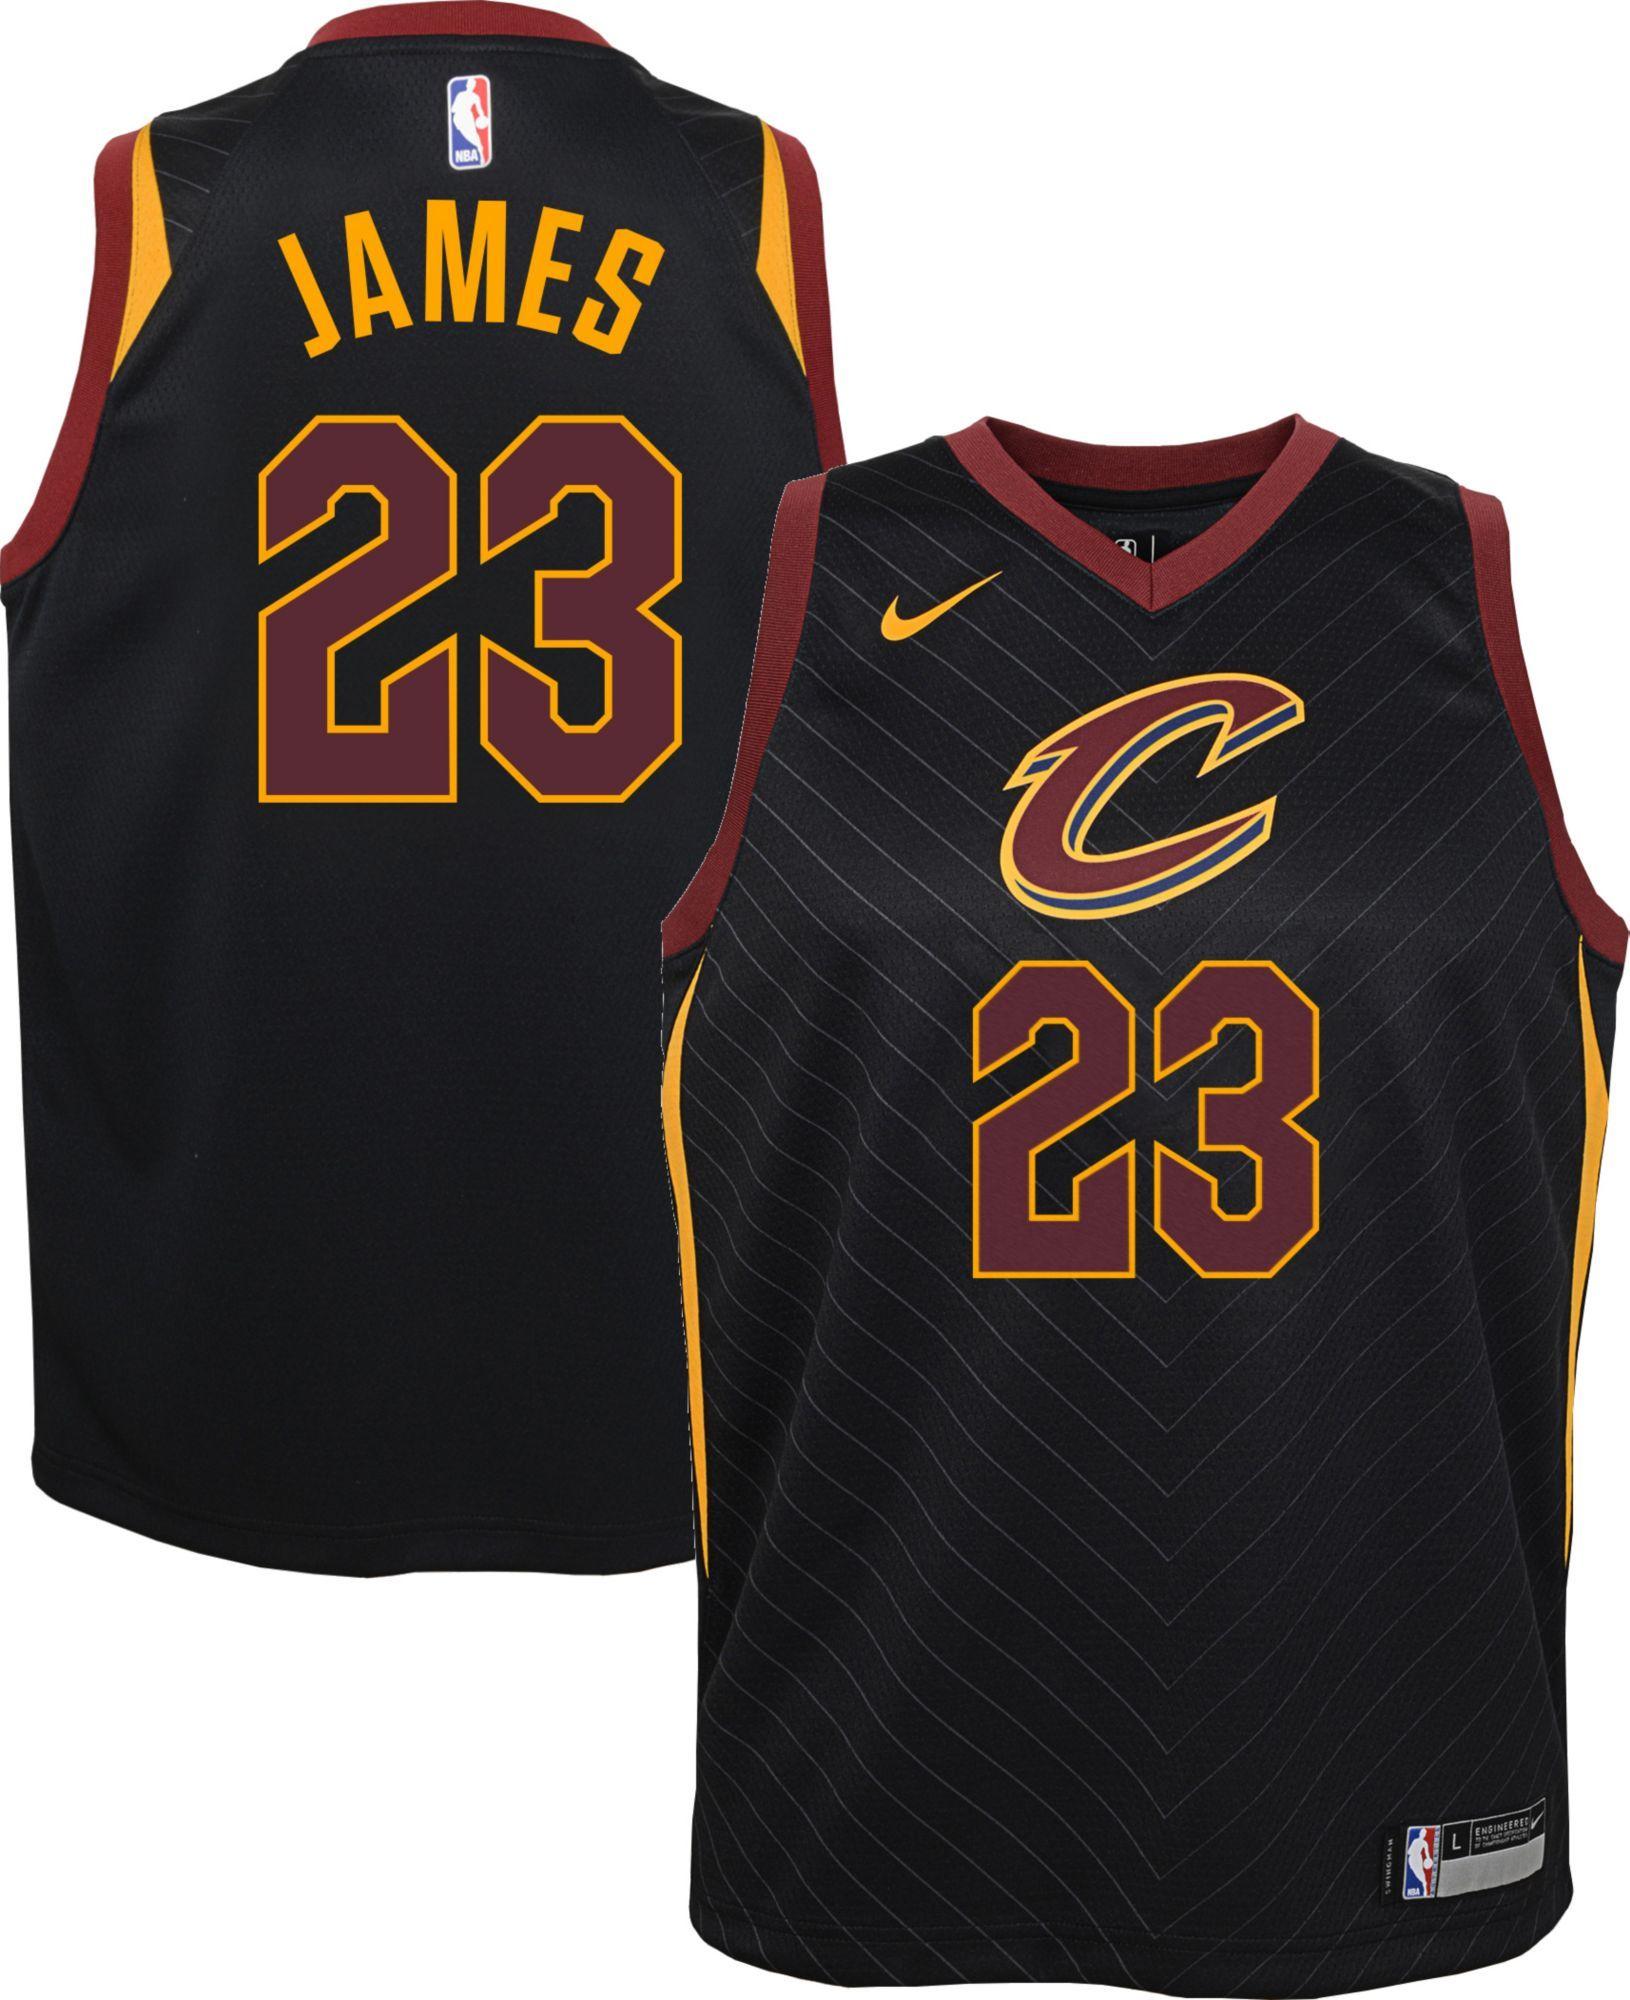 b8067476f08 ... cheap nike youth cleveland cavaliers lebron james 23 black statement  dri fit swingman jersey 75c34 cea49.